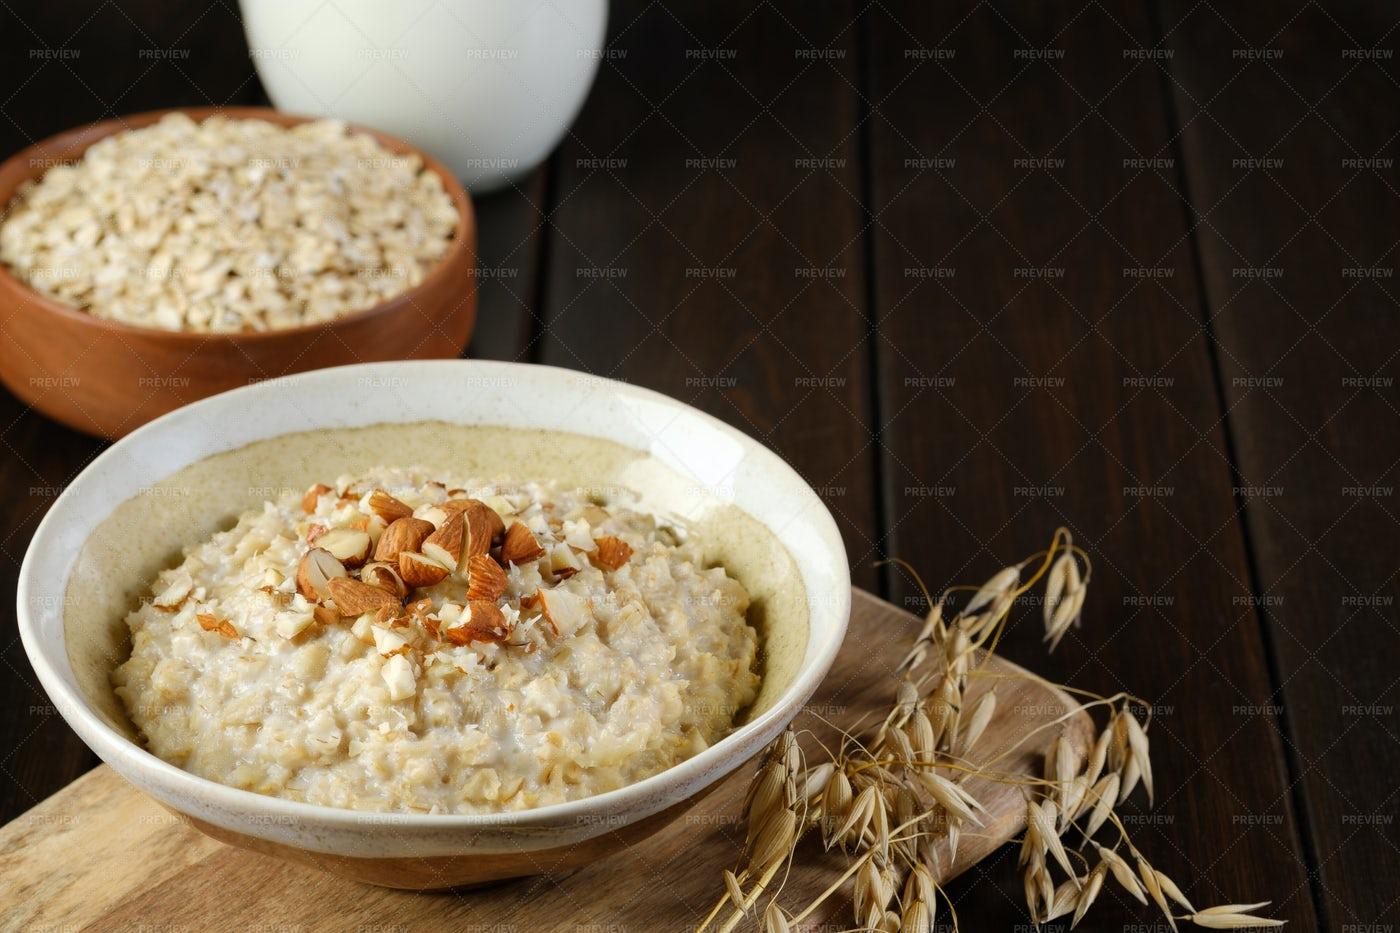 Oatmeal Porridge With Copy Space: Stock Photos